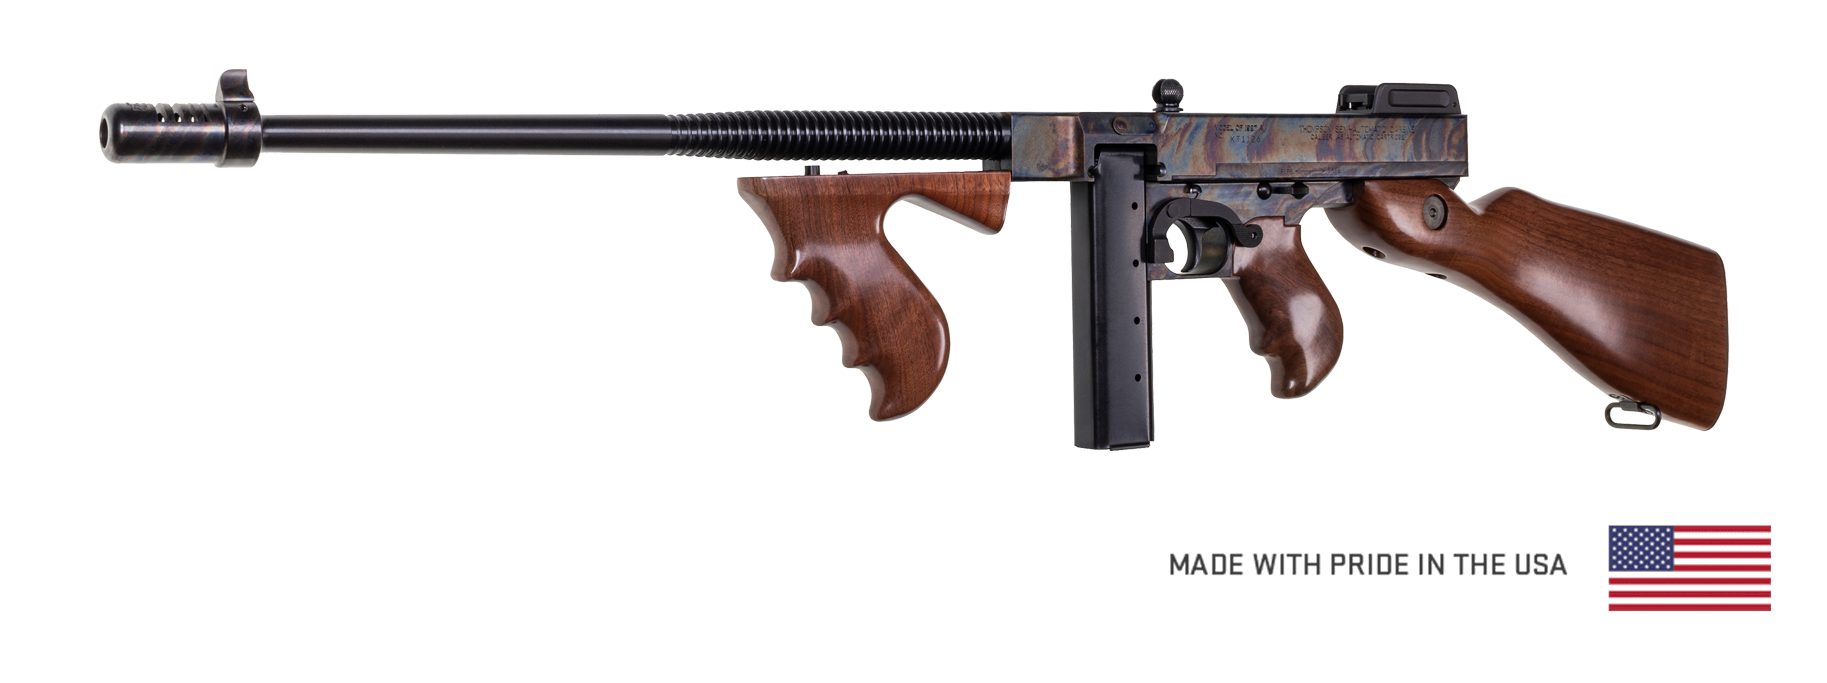 Case Hardened Thompson - Auto-Ordnance | Original